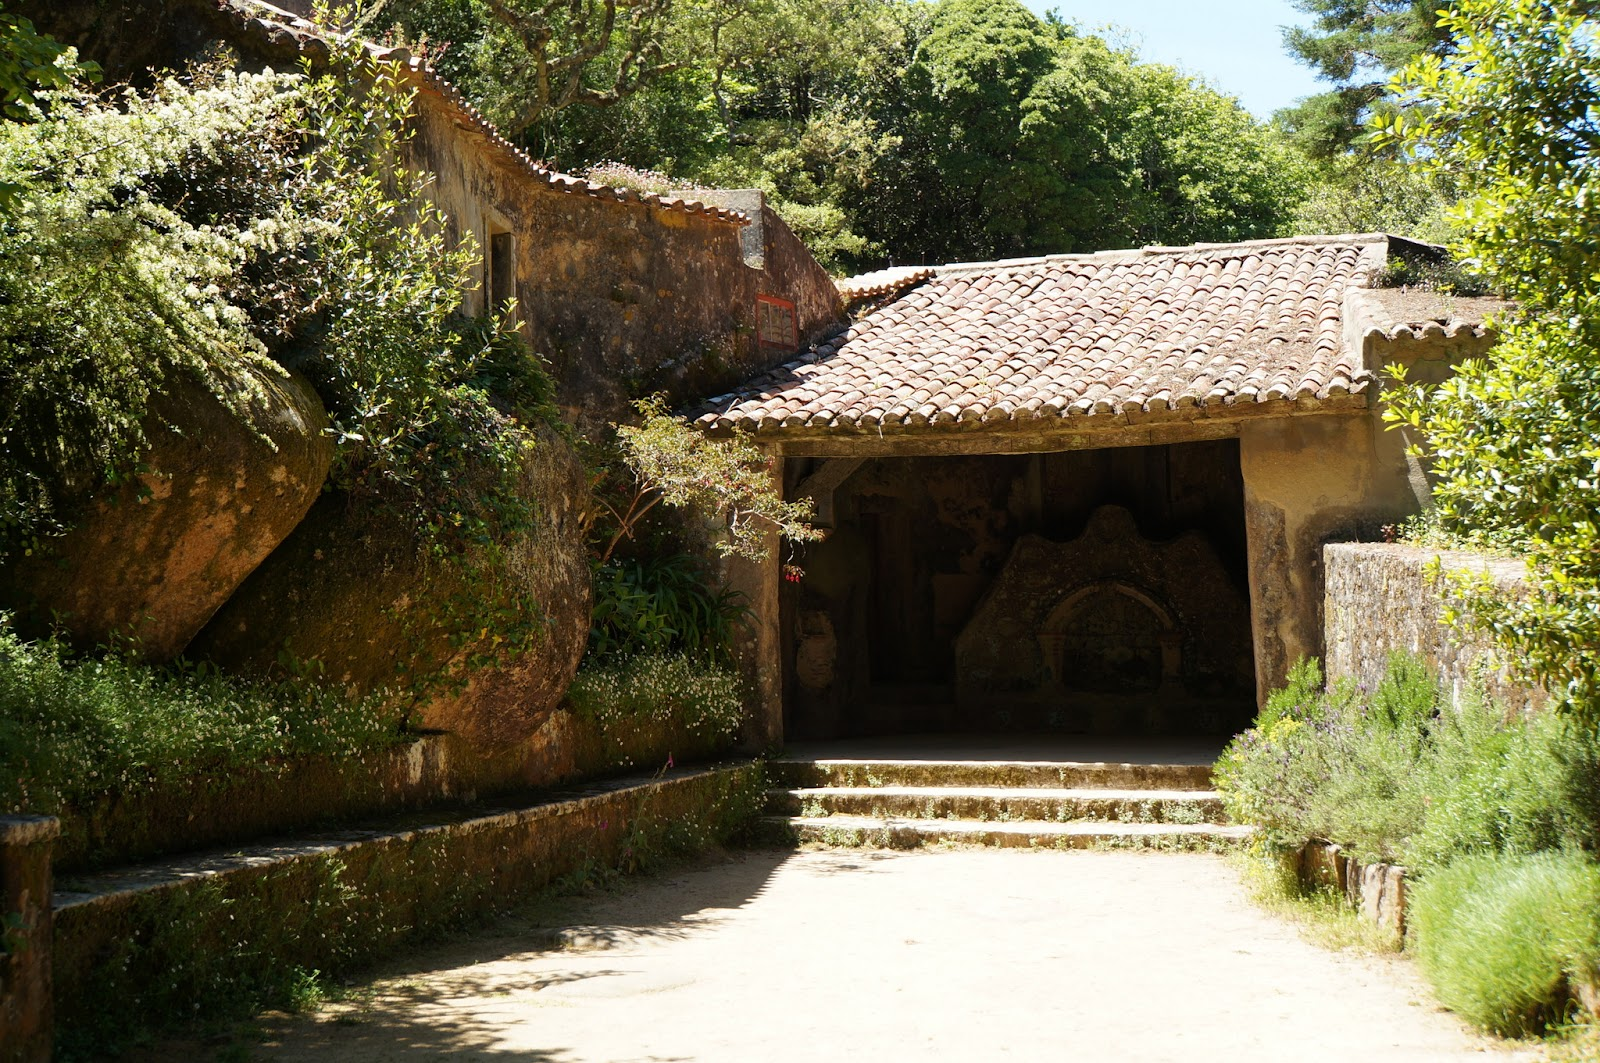 Portugal jour 6 les merveilles de la serra de sintra for La serra progetta le planimetrie